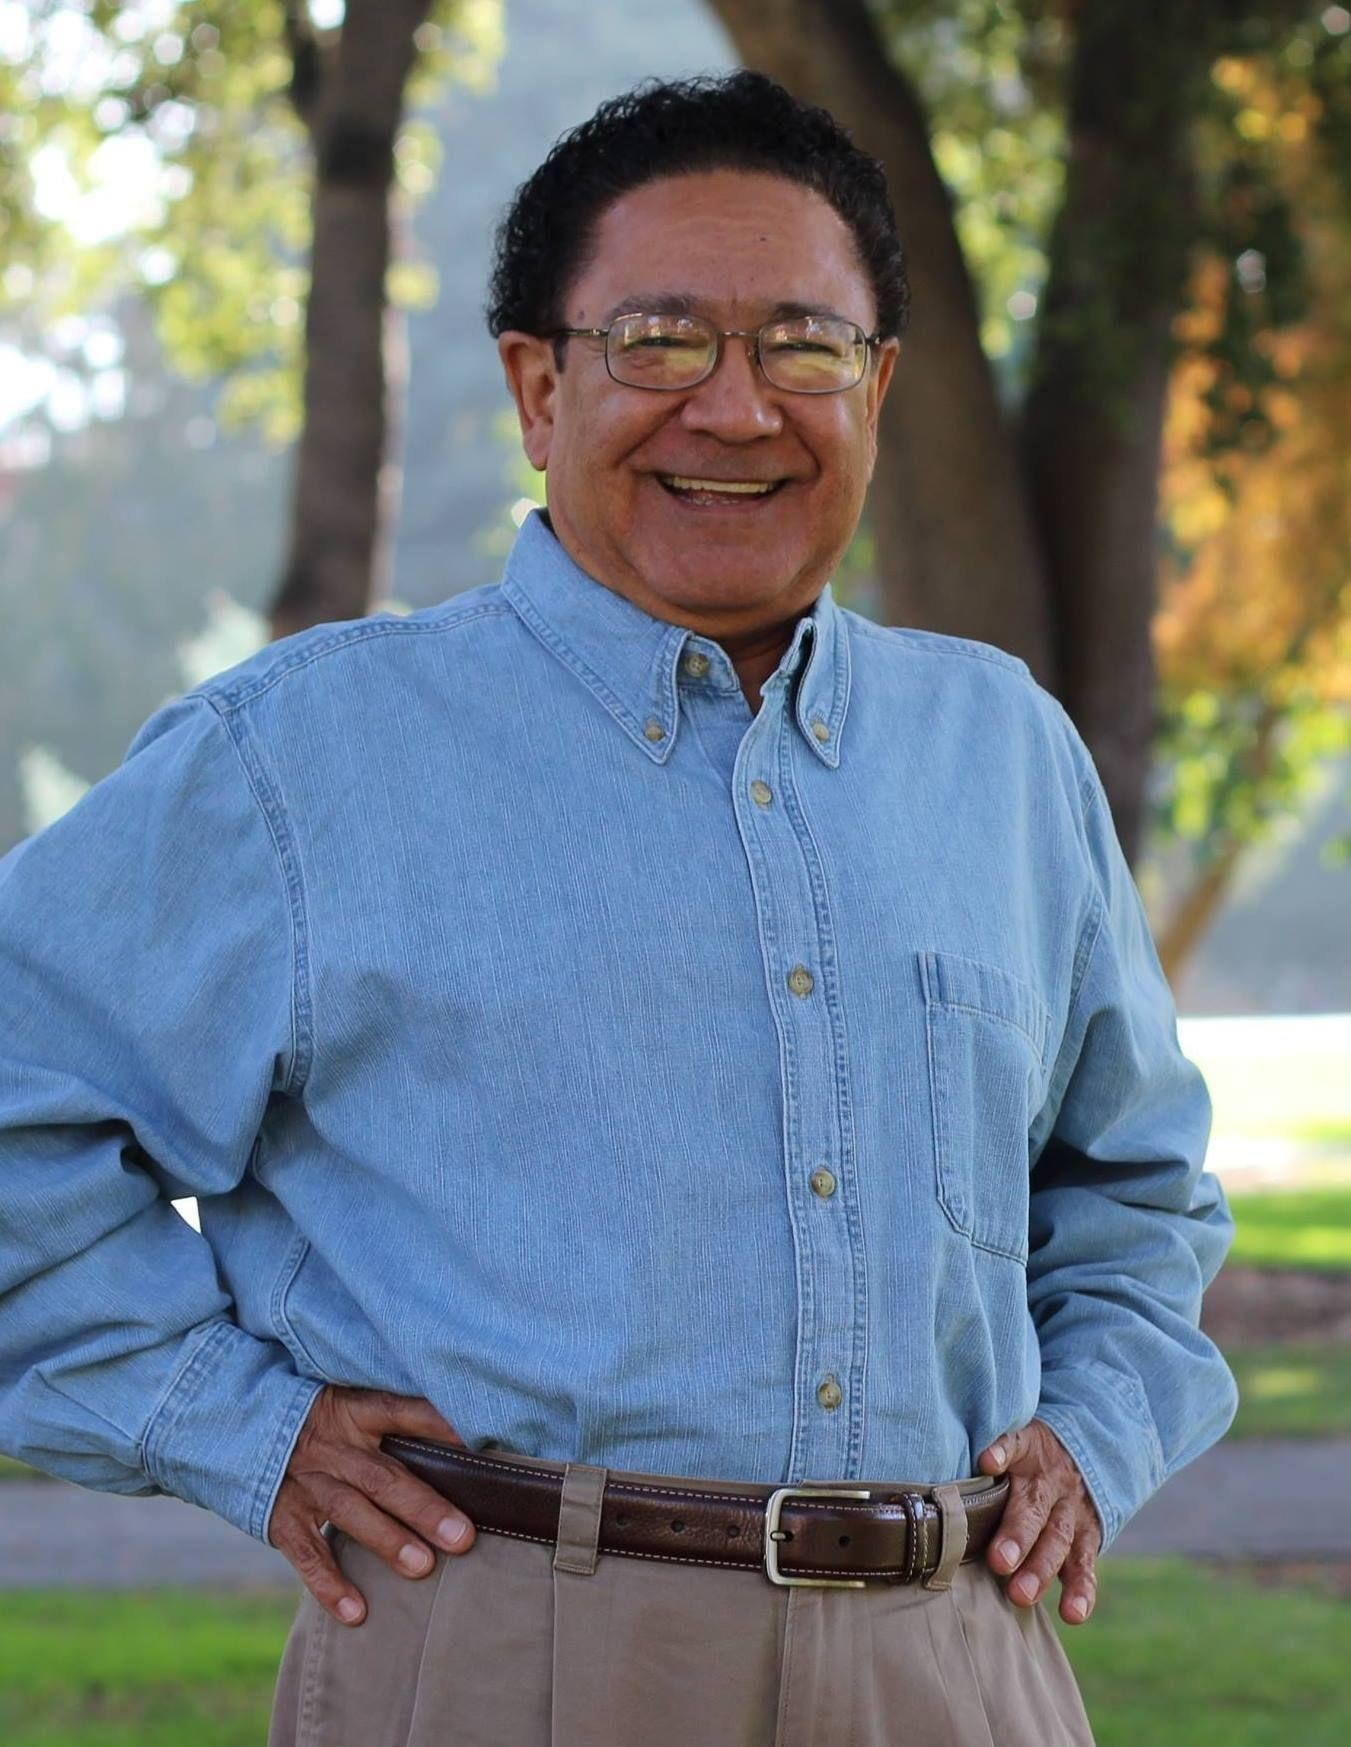 NICHOLAS A. VALENZUELA, Ph.D